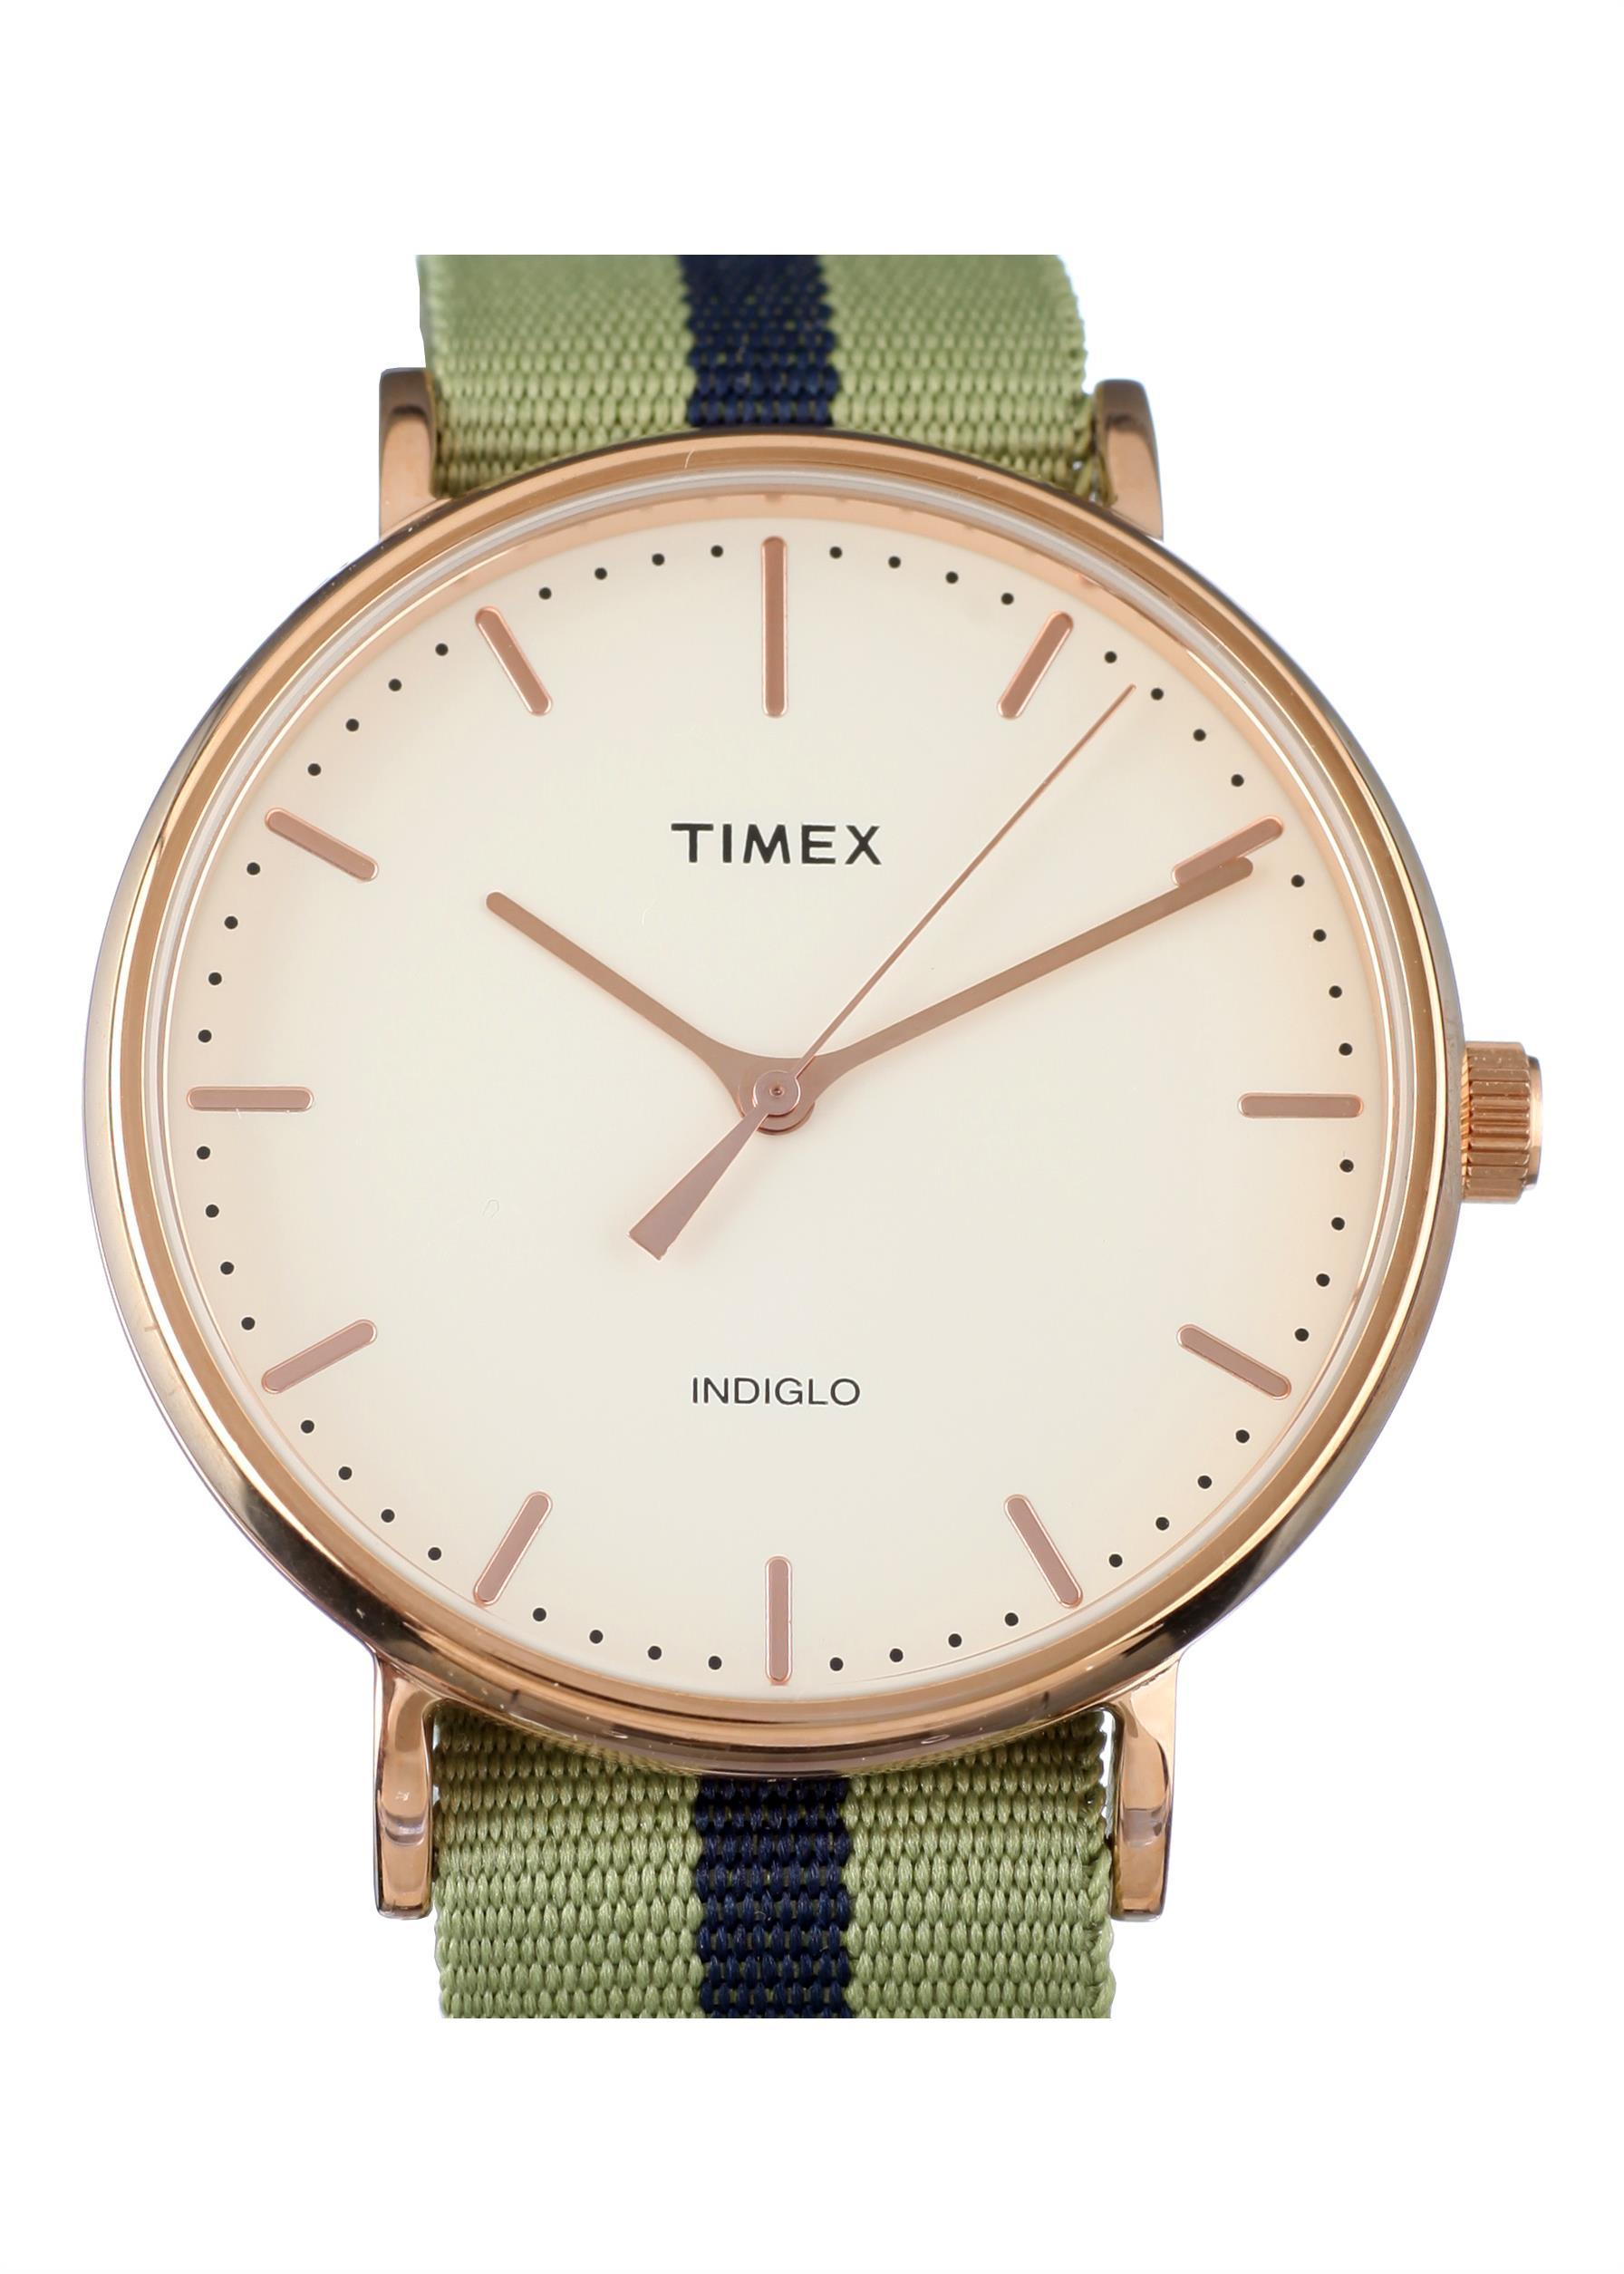 TIMEX ARCHIVE Mens Wrist Watch Model FAIRFIELD MPN ABT526